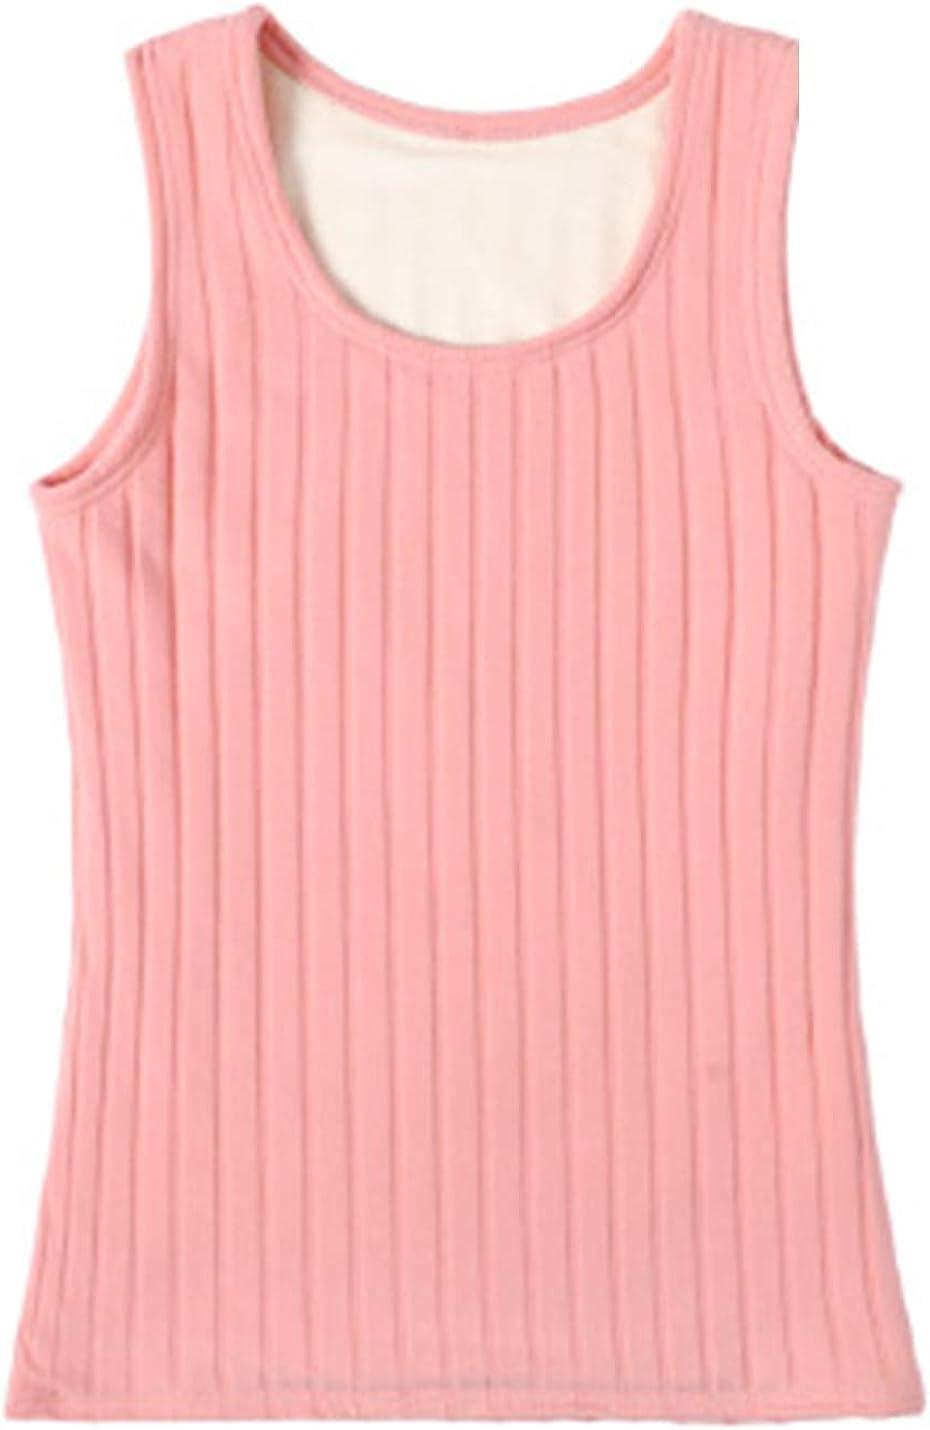 Flygo Women's Thermal Underwear Winter Warm Base Layer Fleece Lined Cami Tank Tops